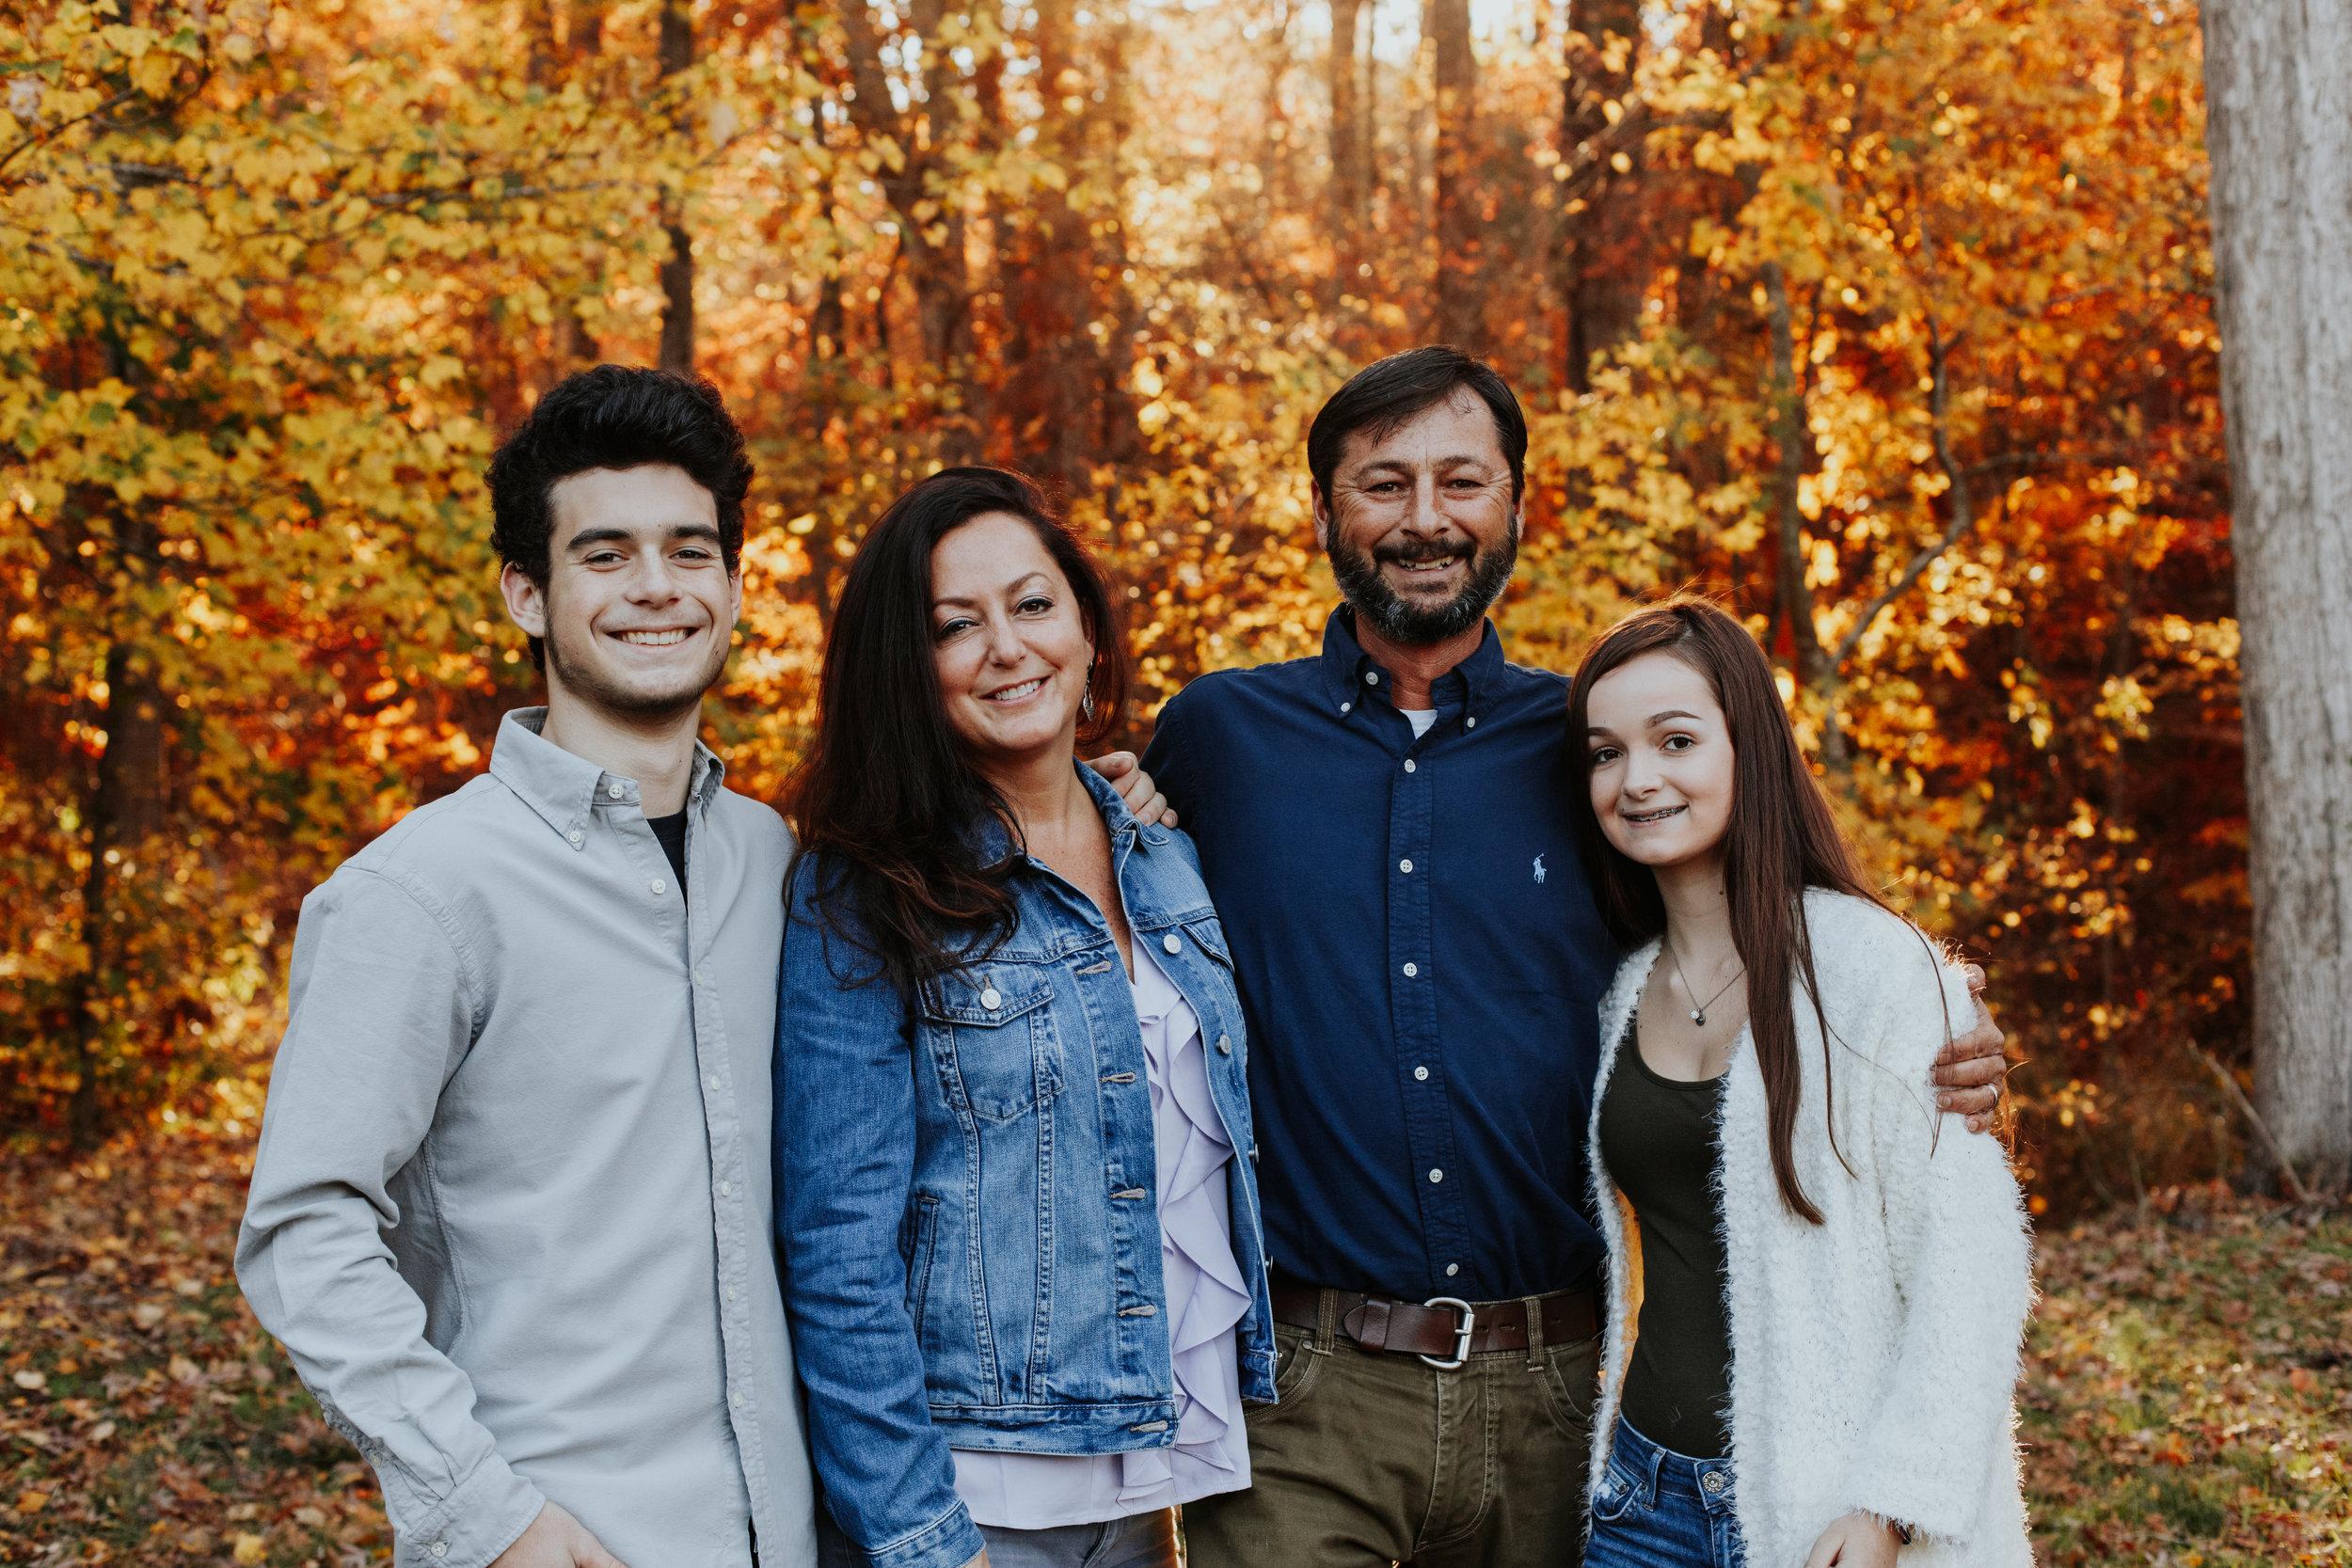 thedavisfamily-31.jpg